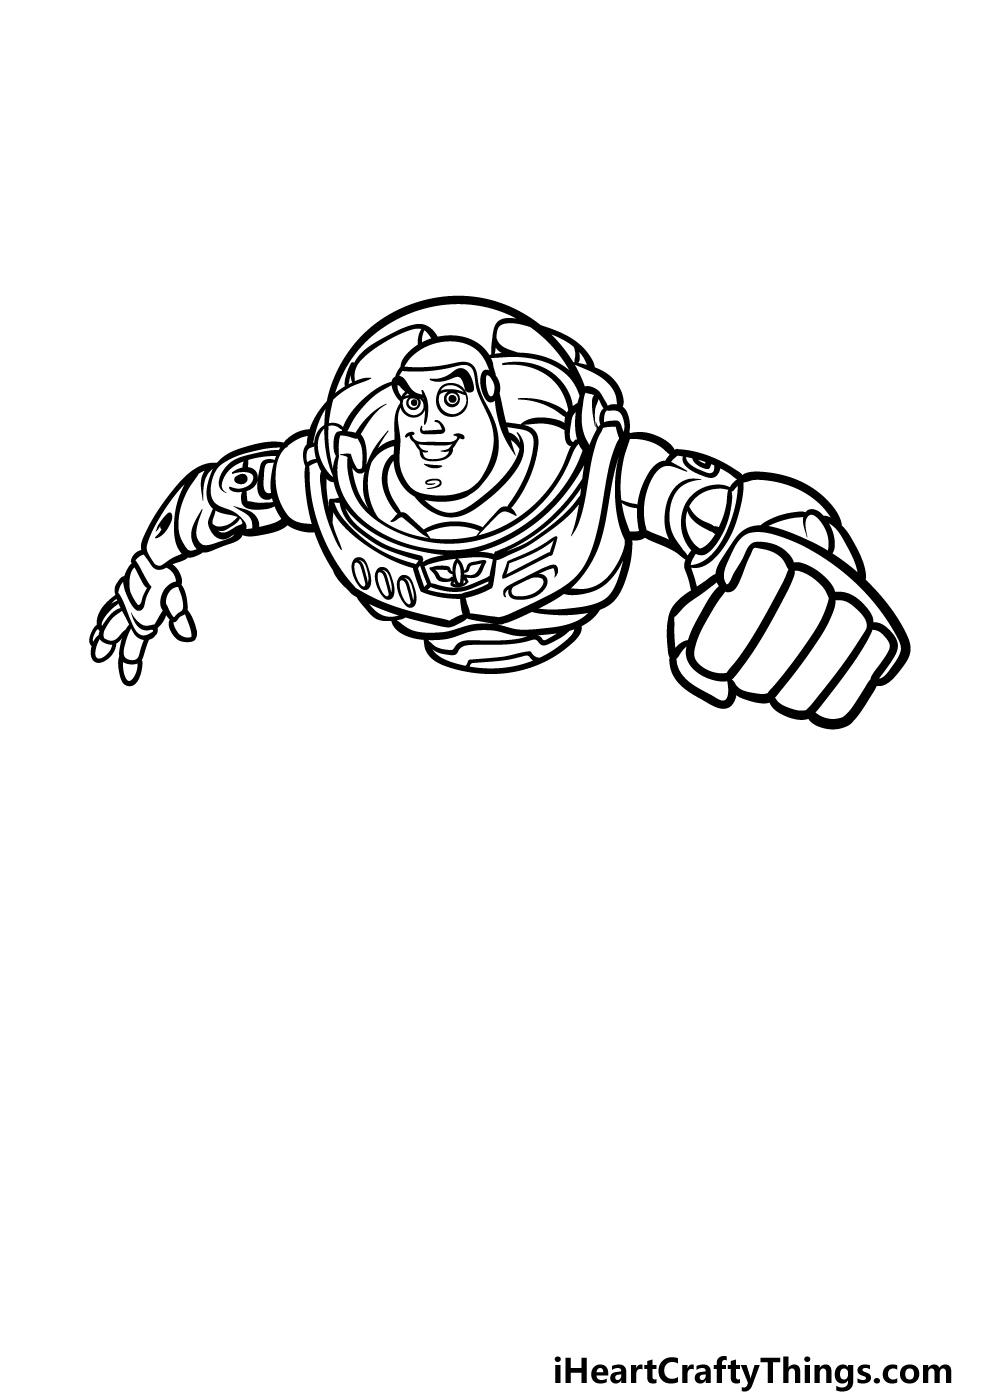 drawing Buzz Lightyear step 4